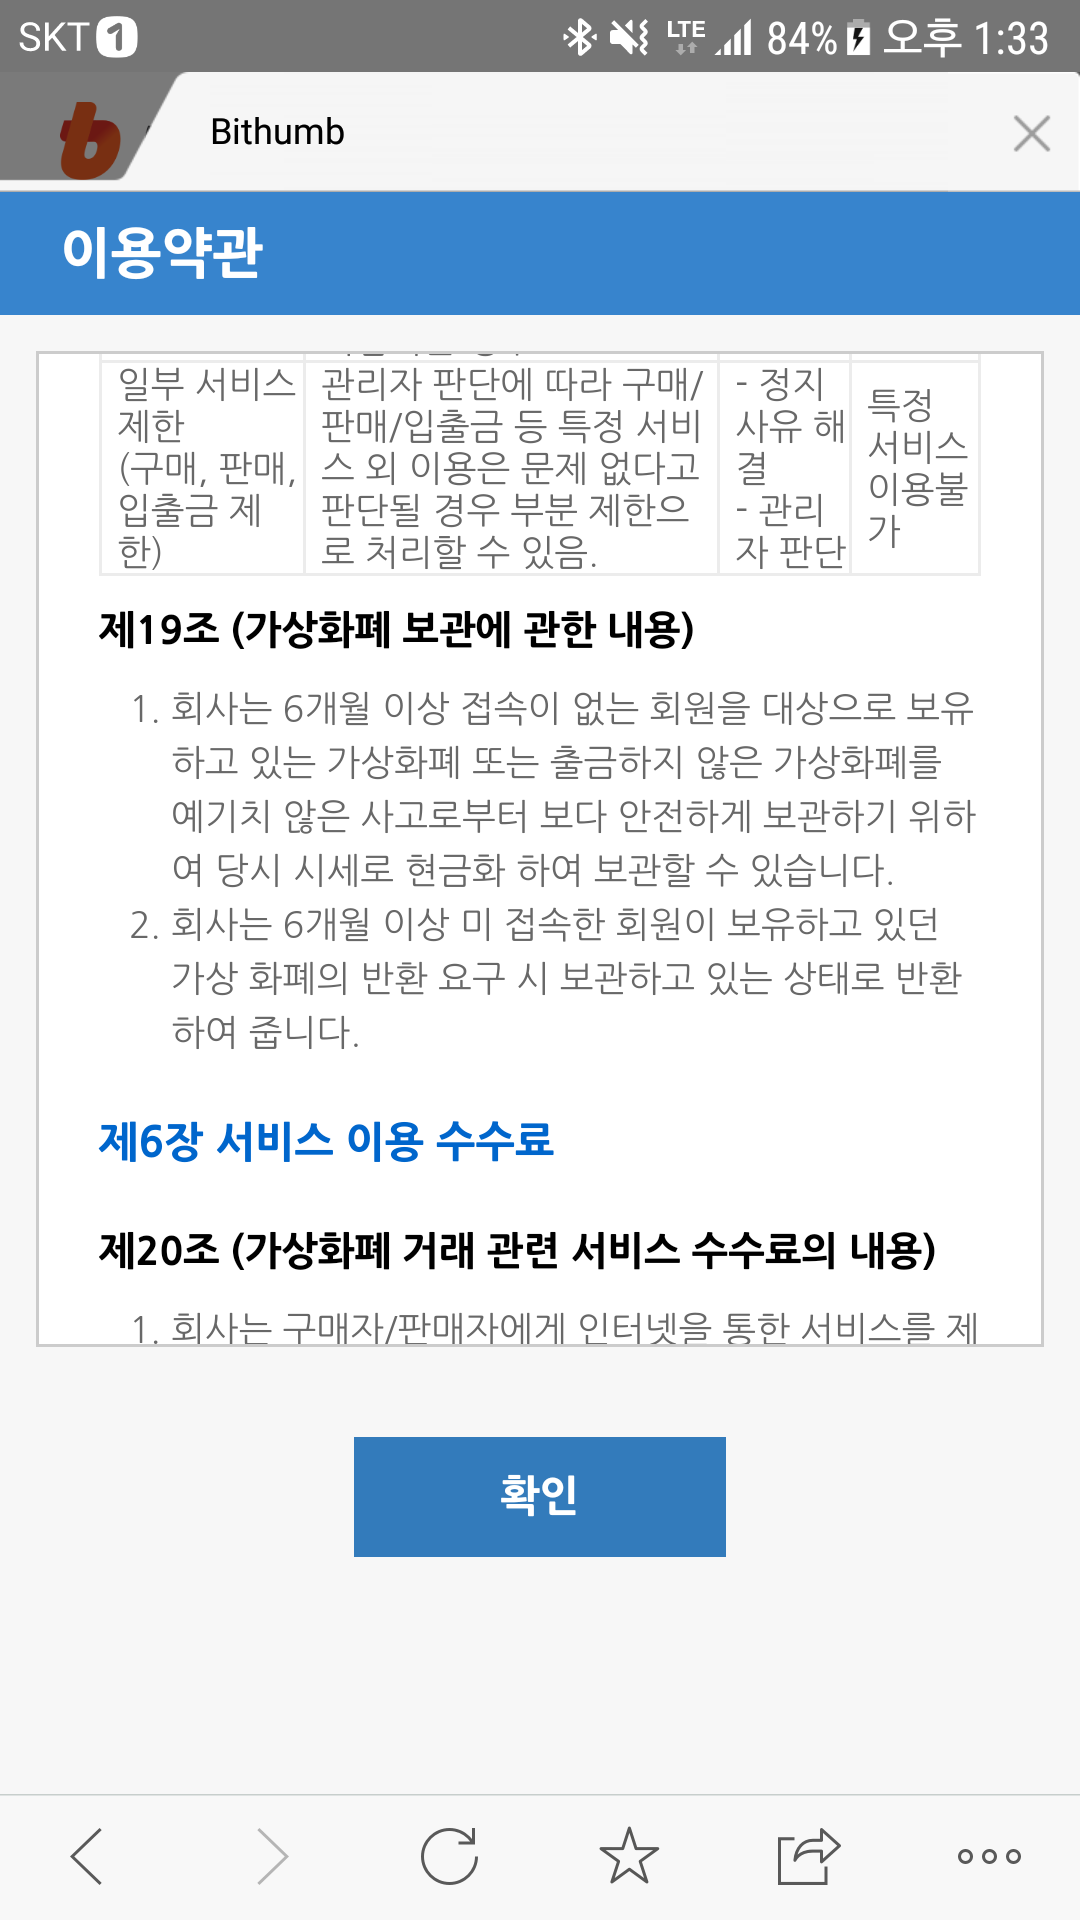 Screenshot_20171115-133337.png